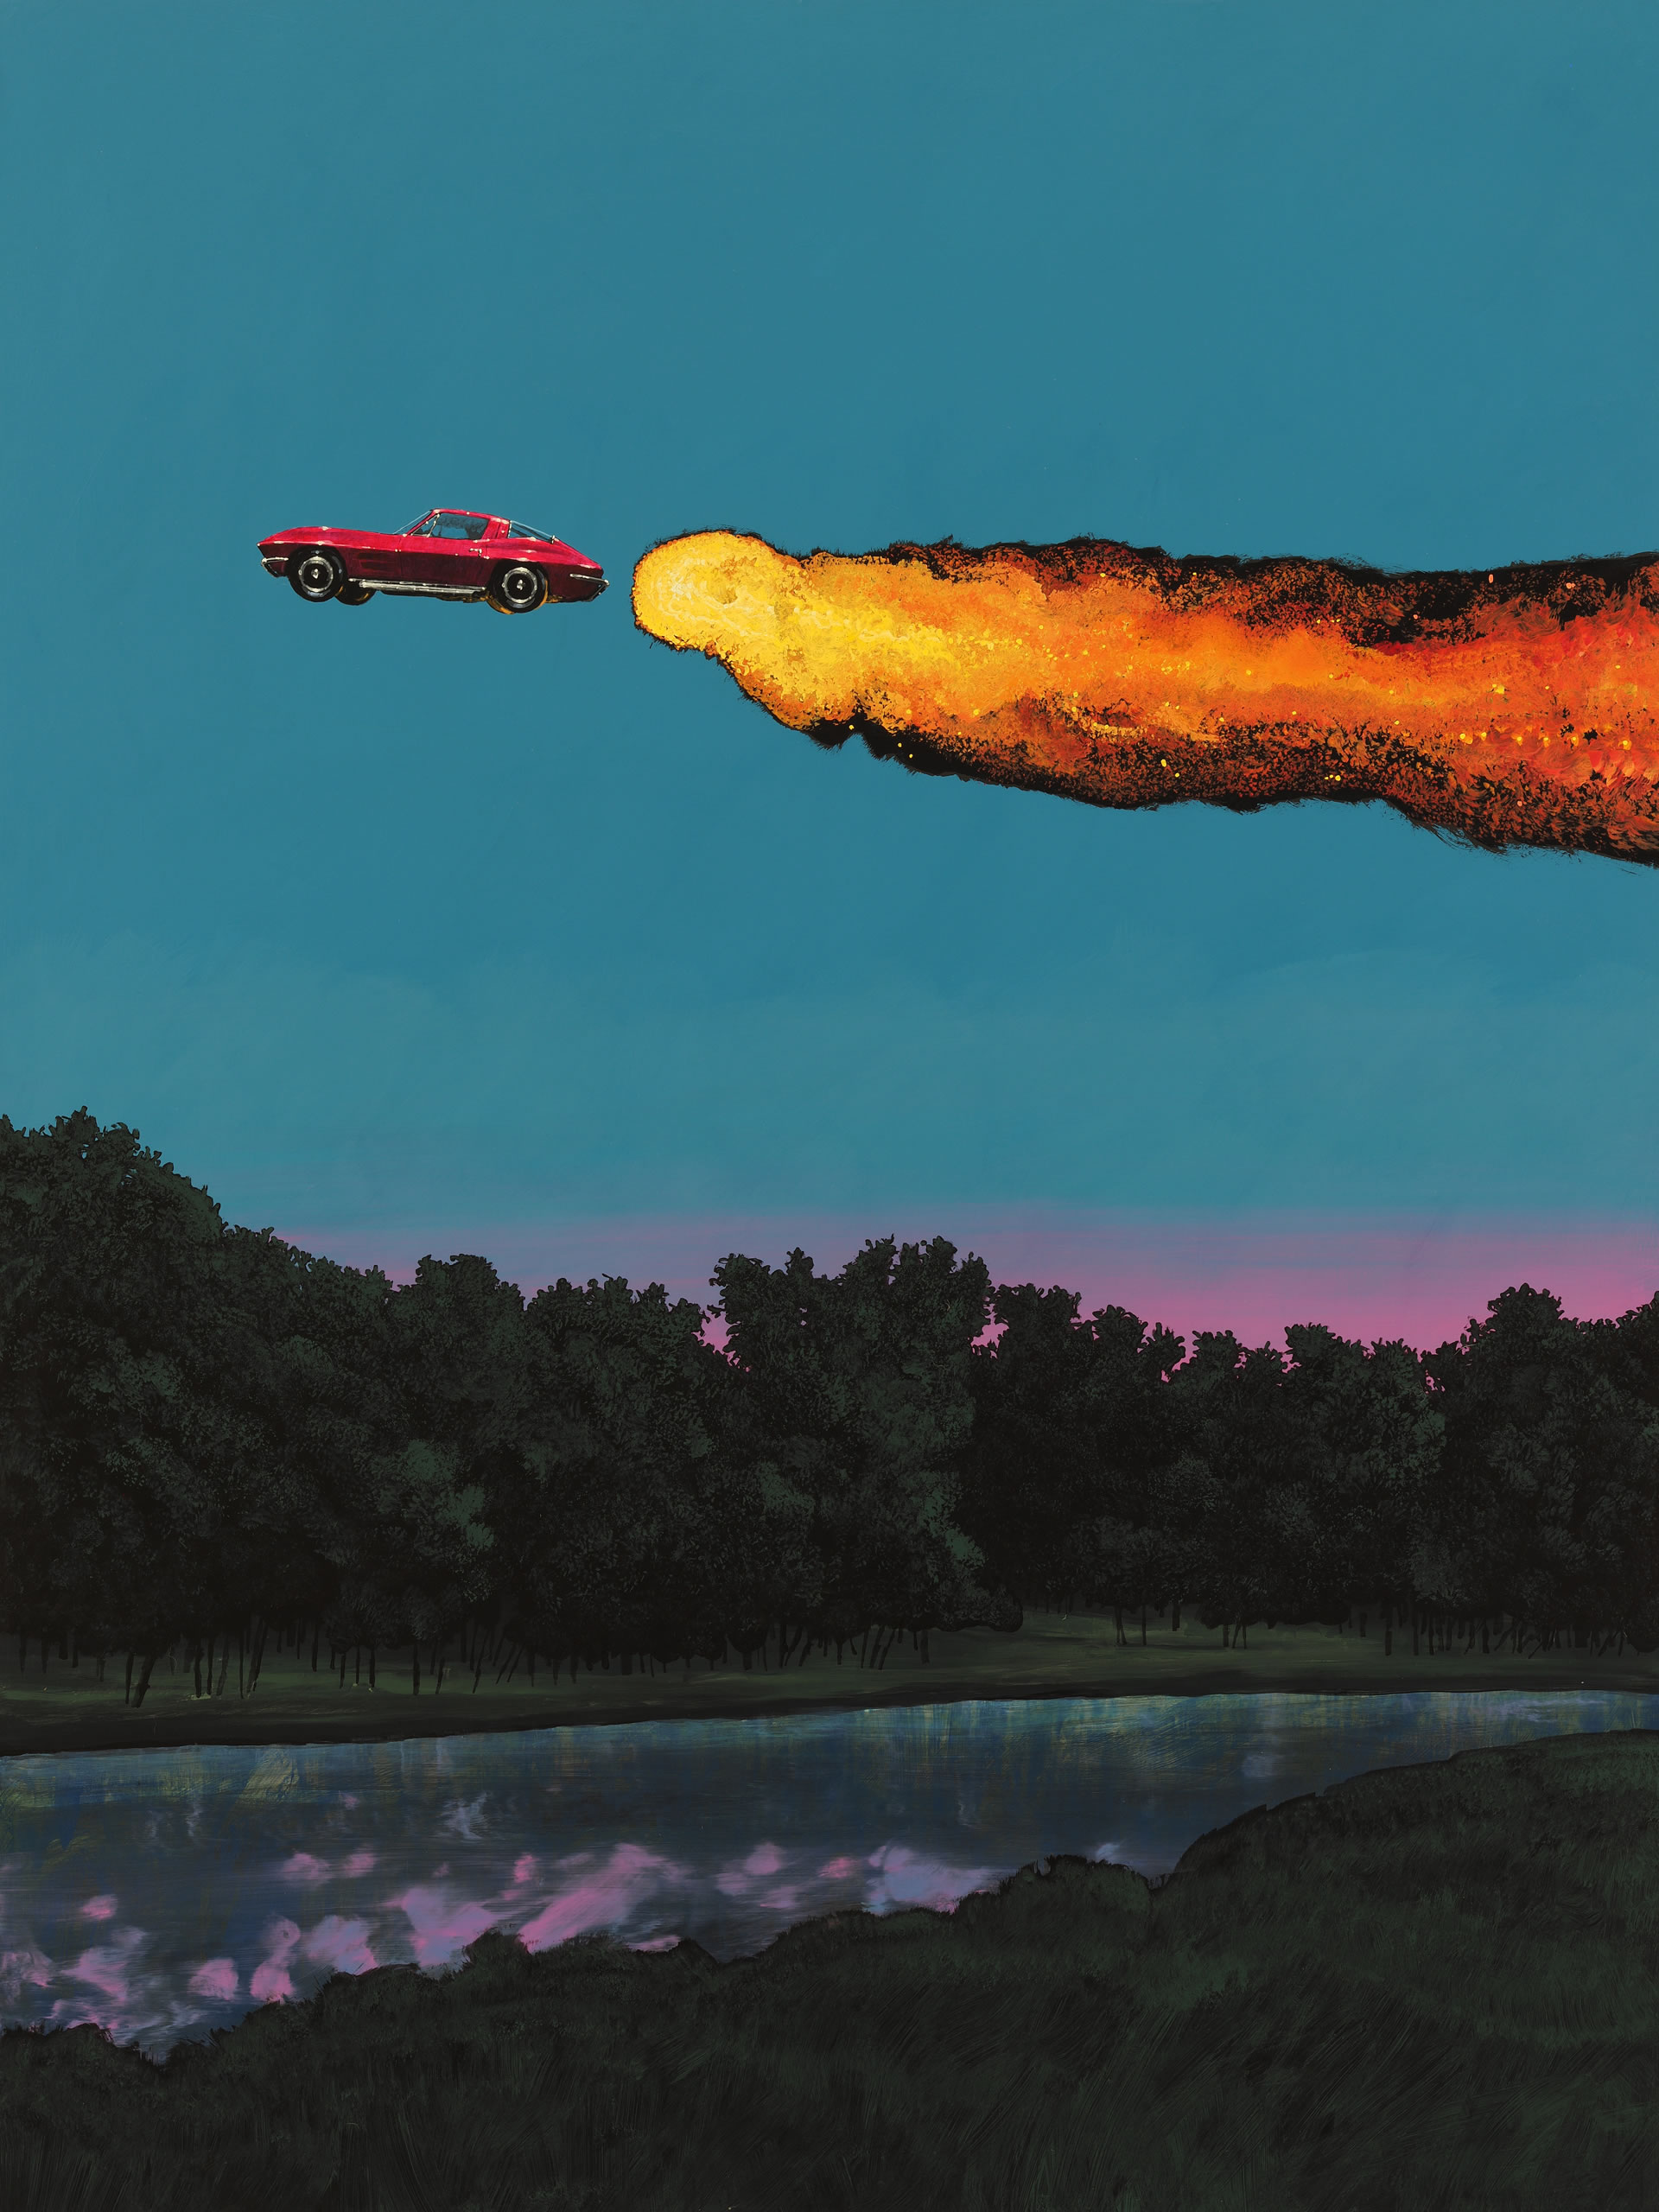 Sean-William-Randall-Crossing-40x30-Online-Art-Galleries